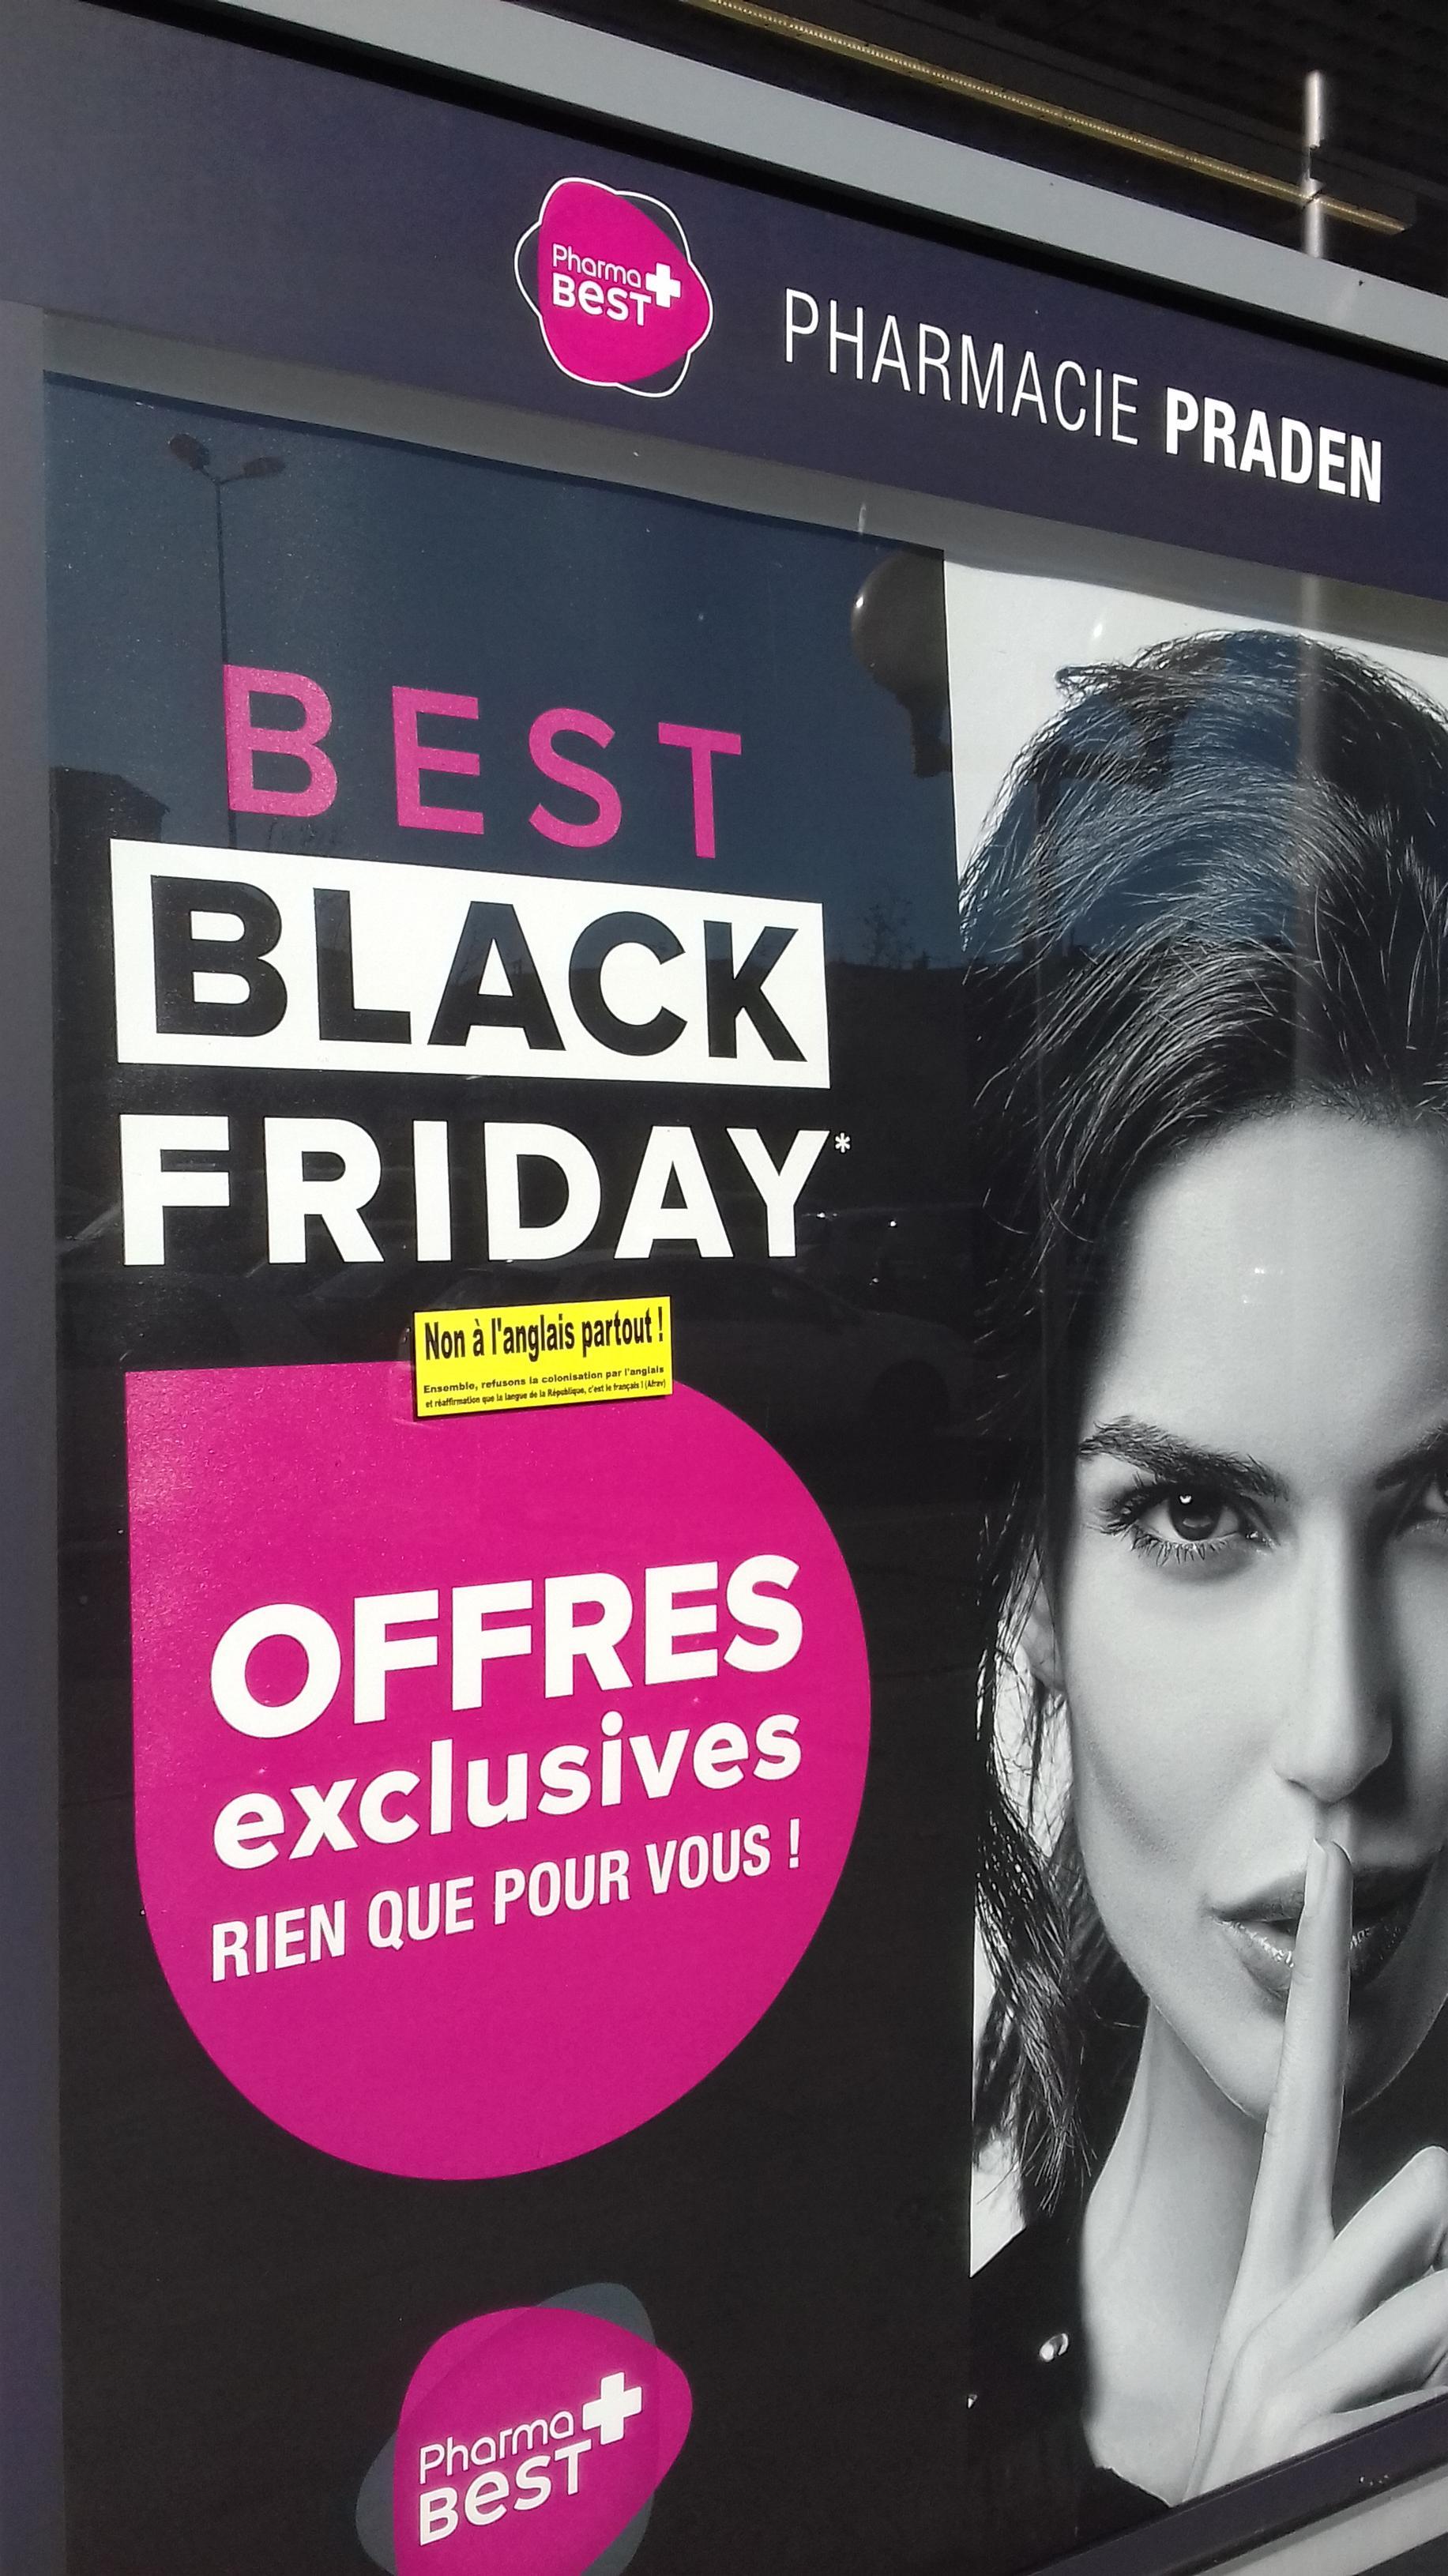 Pharmacie Best-Praden à Alès